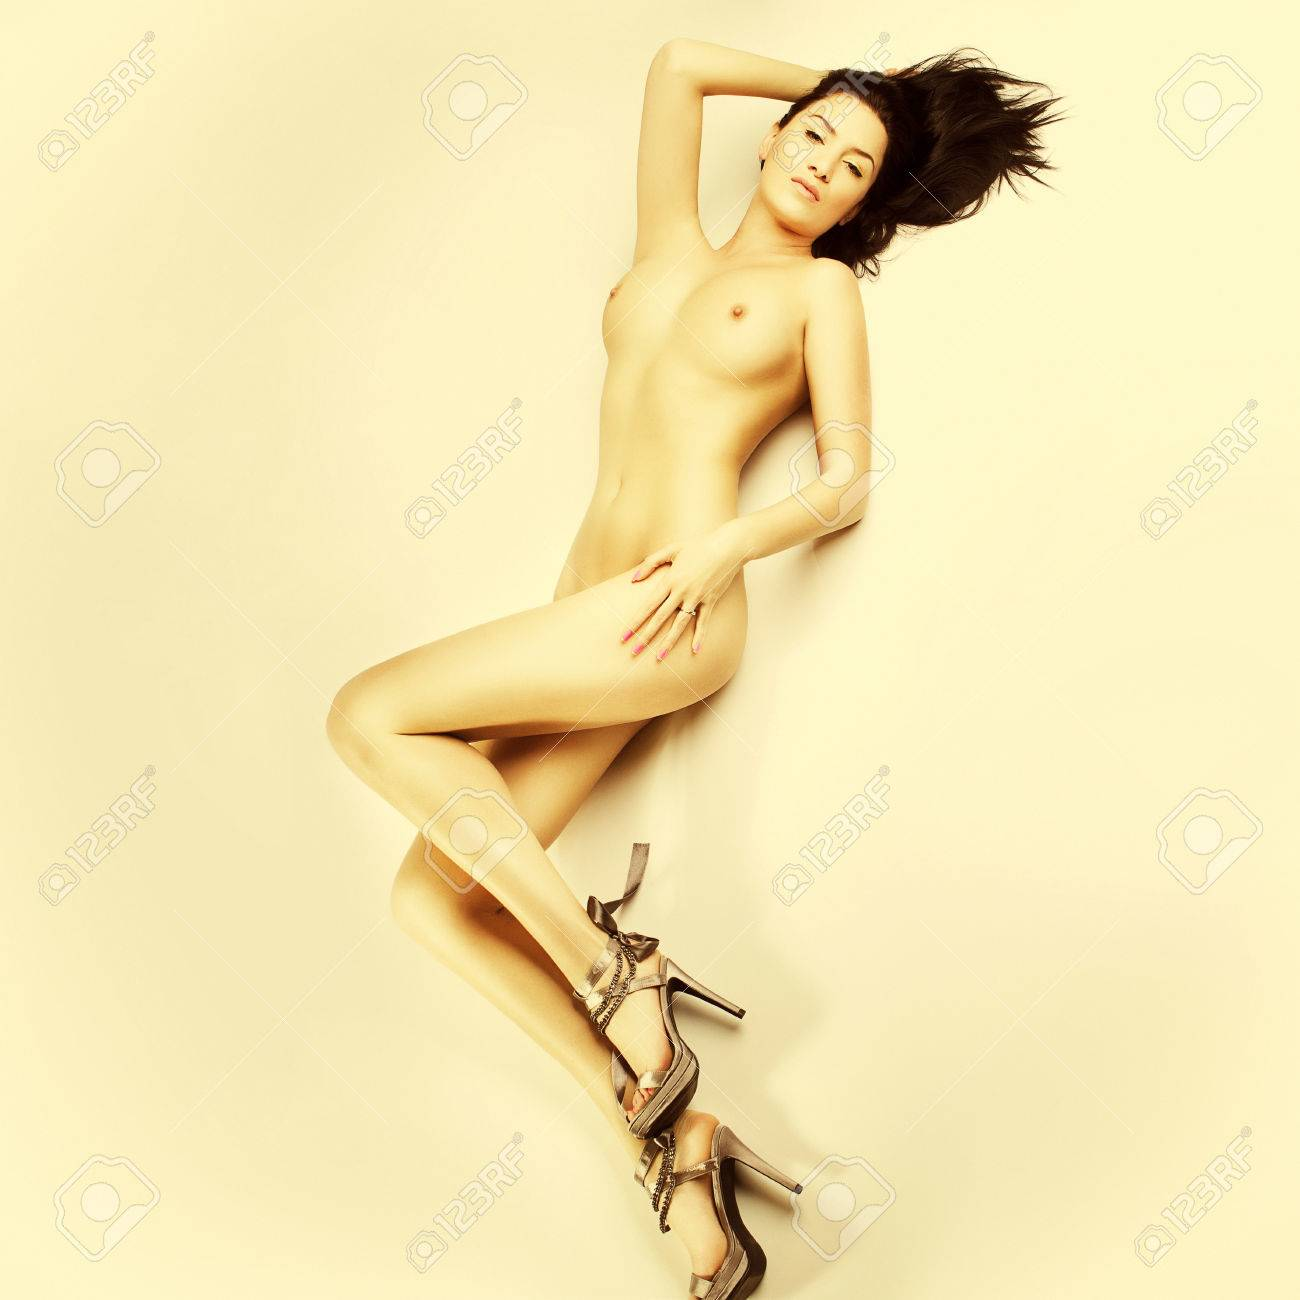 Nudy Mädchen sexy Foto